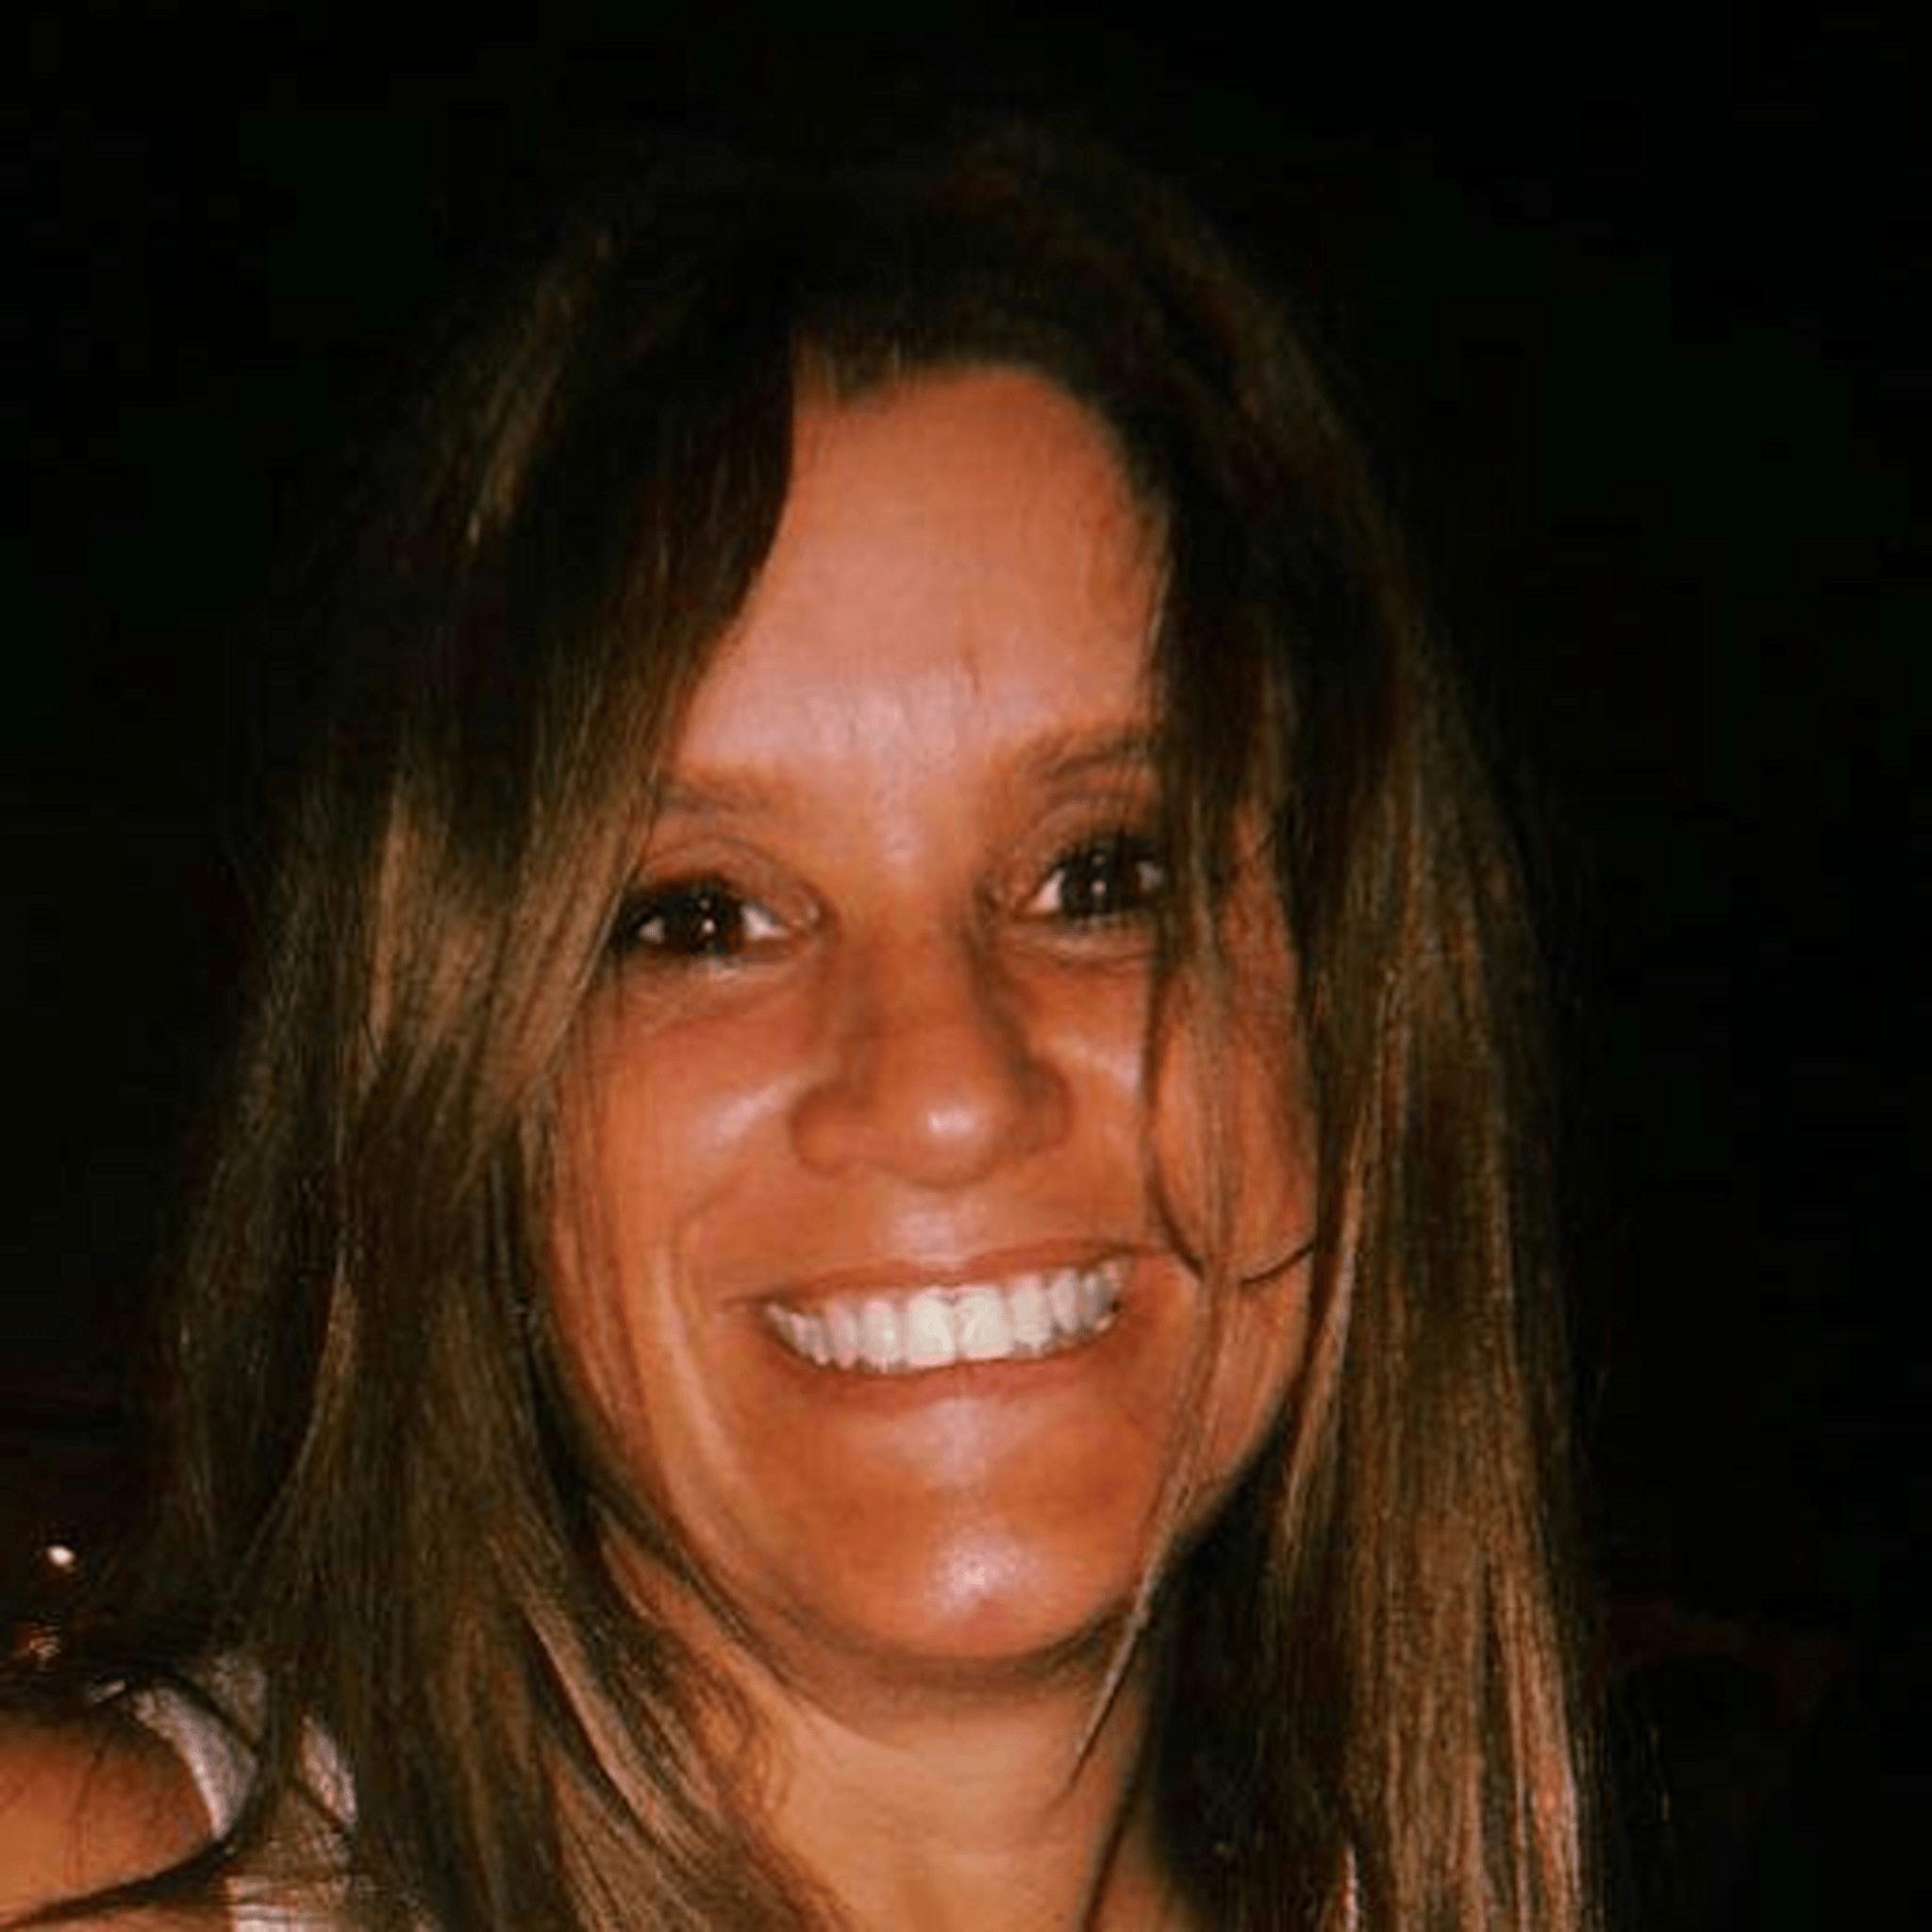 Dra. Alejandra Murano